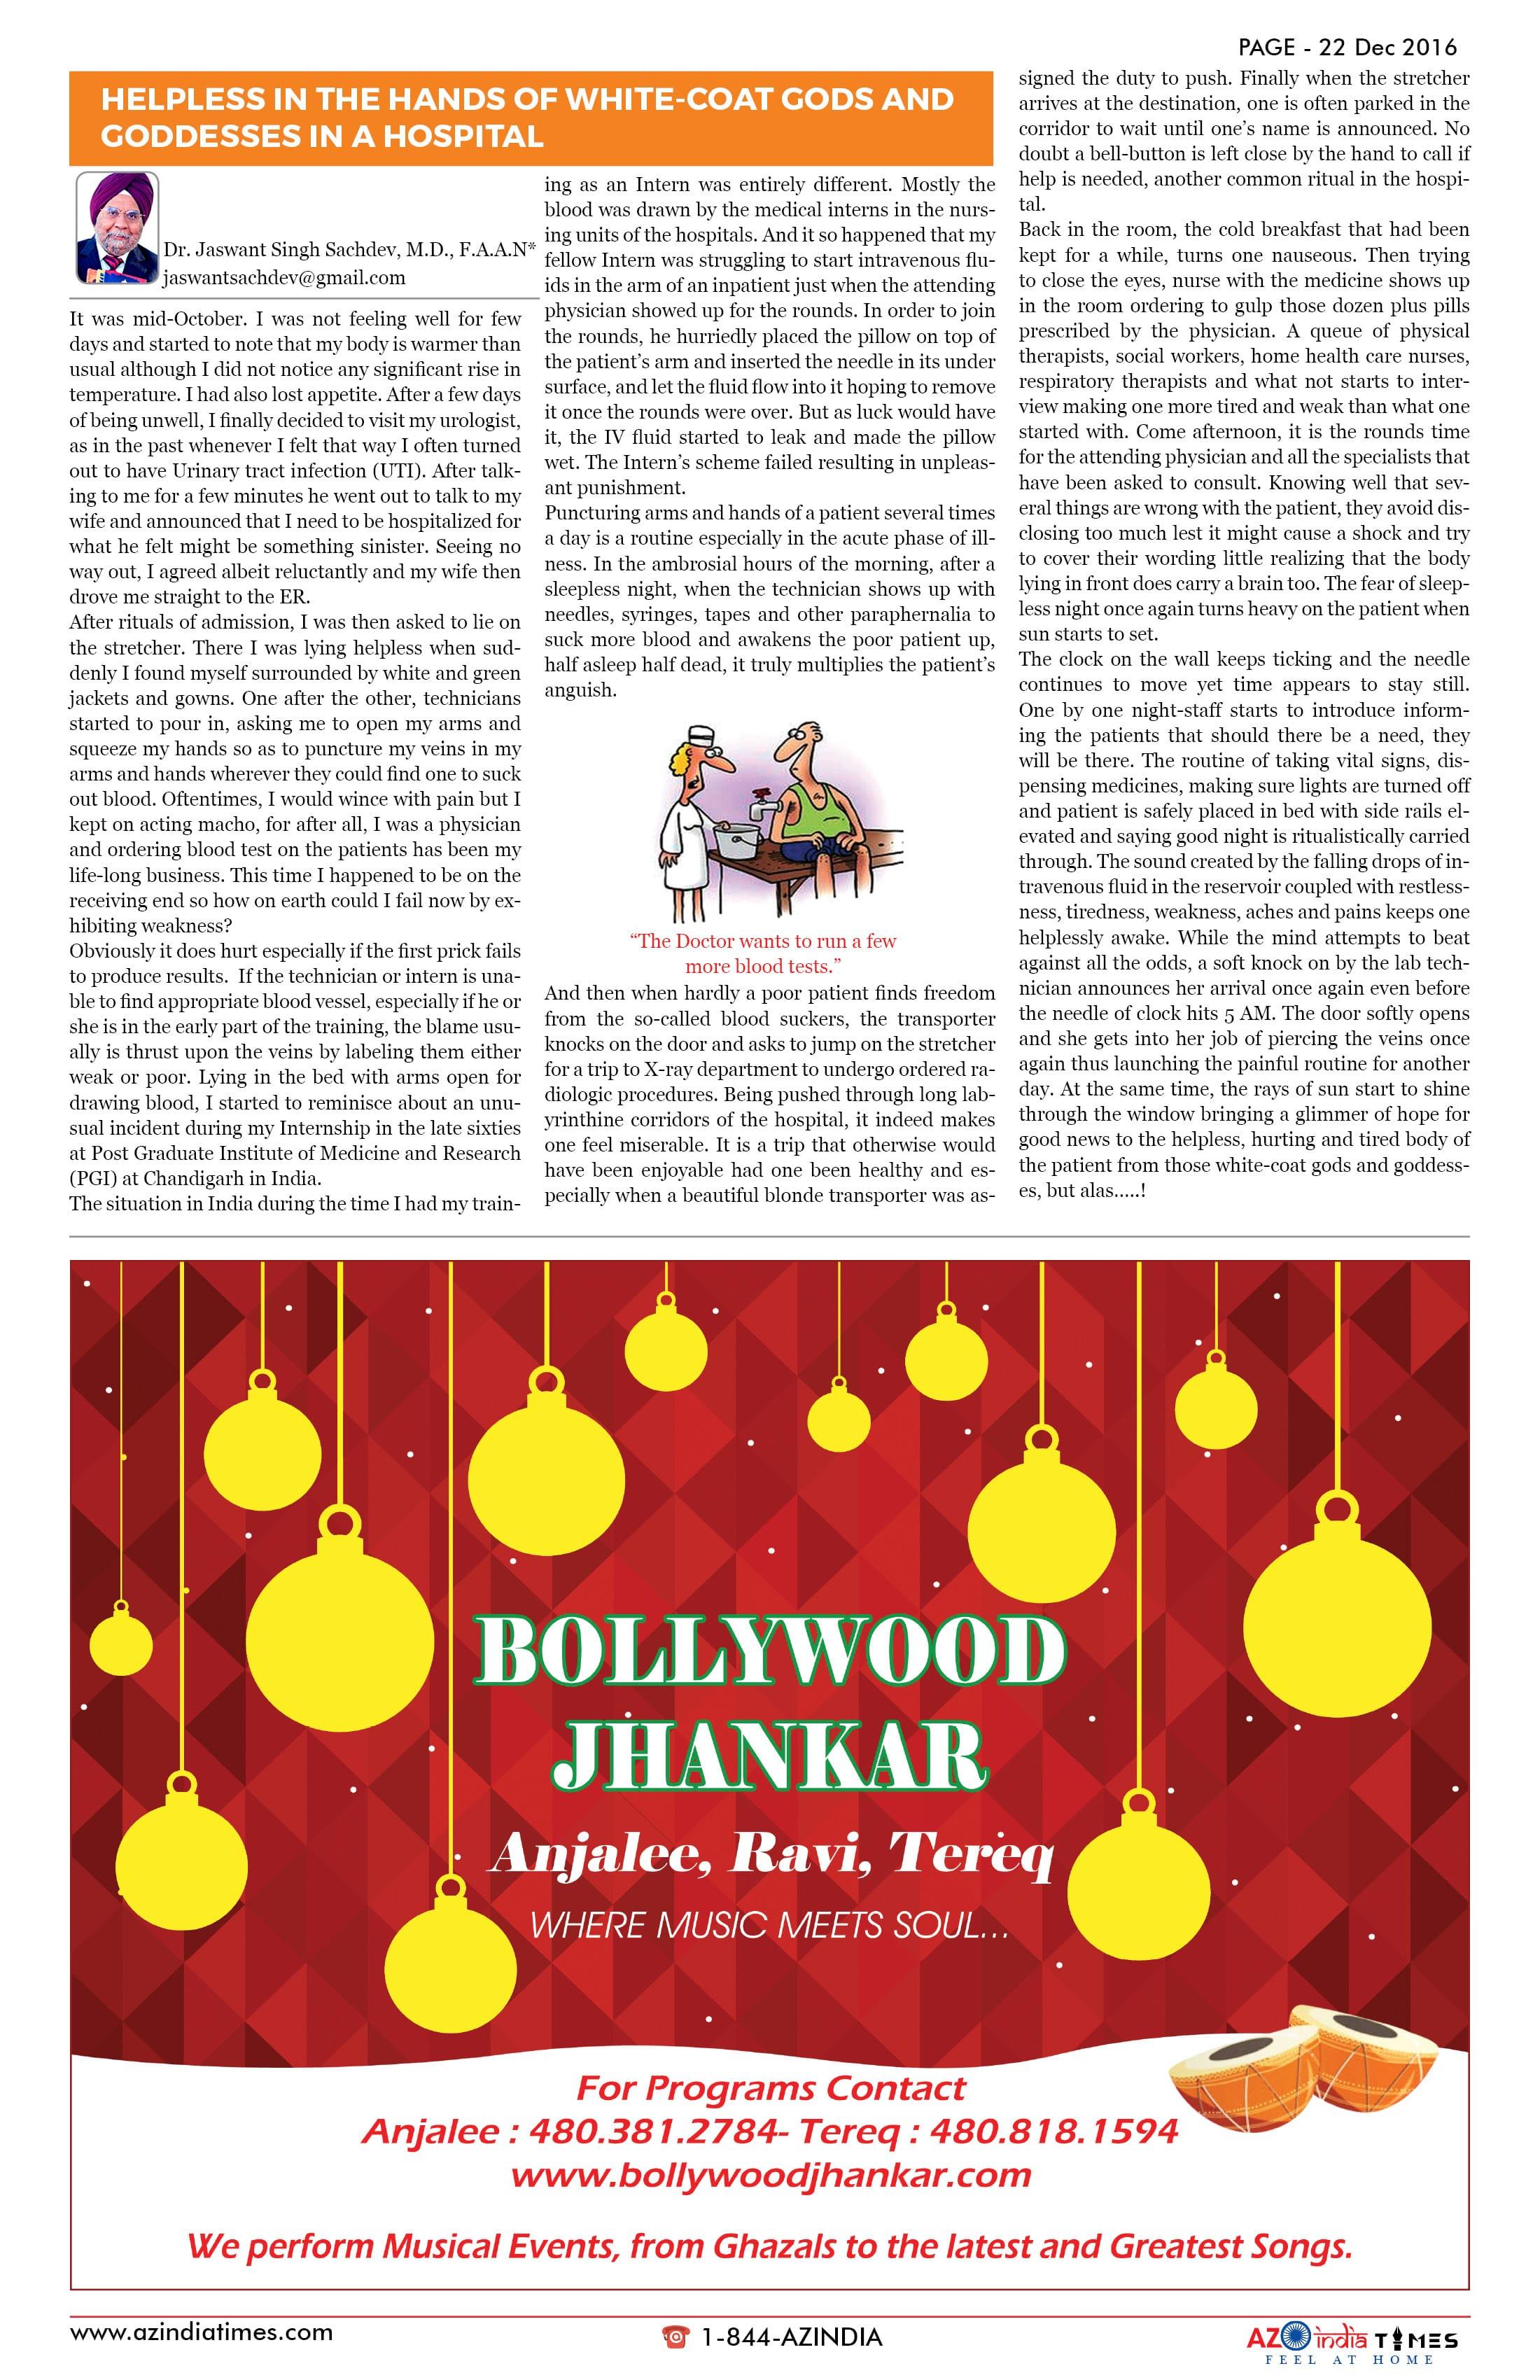 AZ INDIA DECEMBER EDITION 22